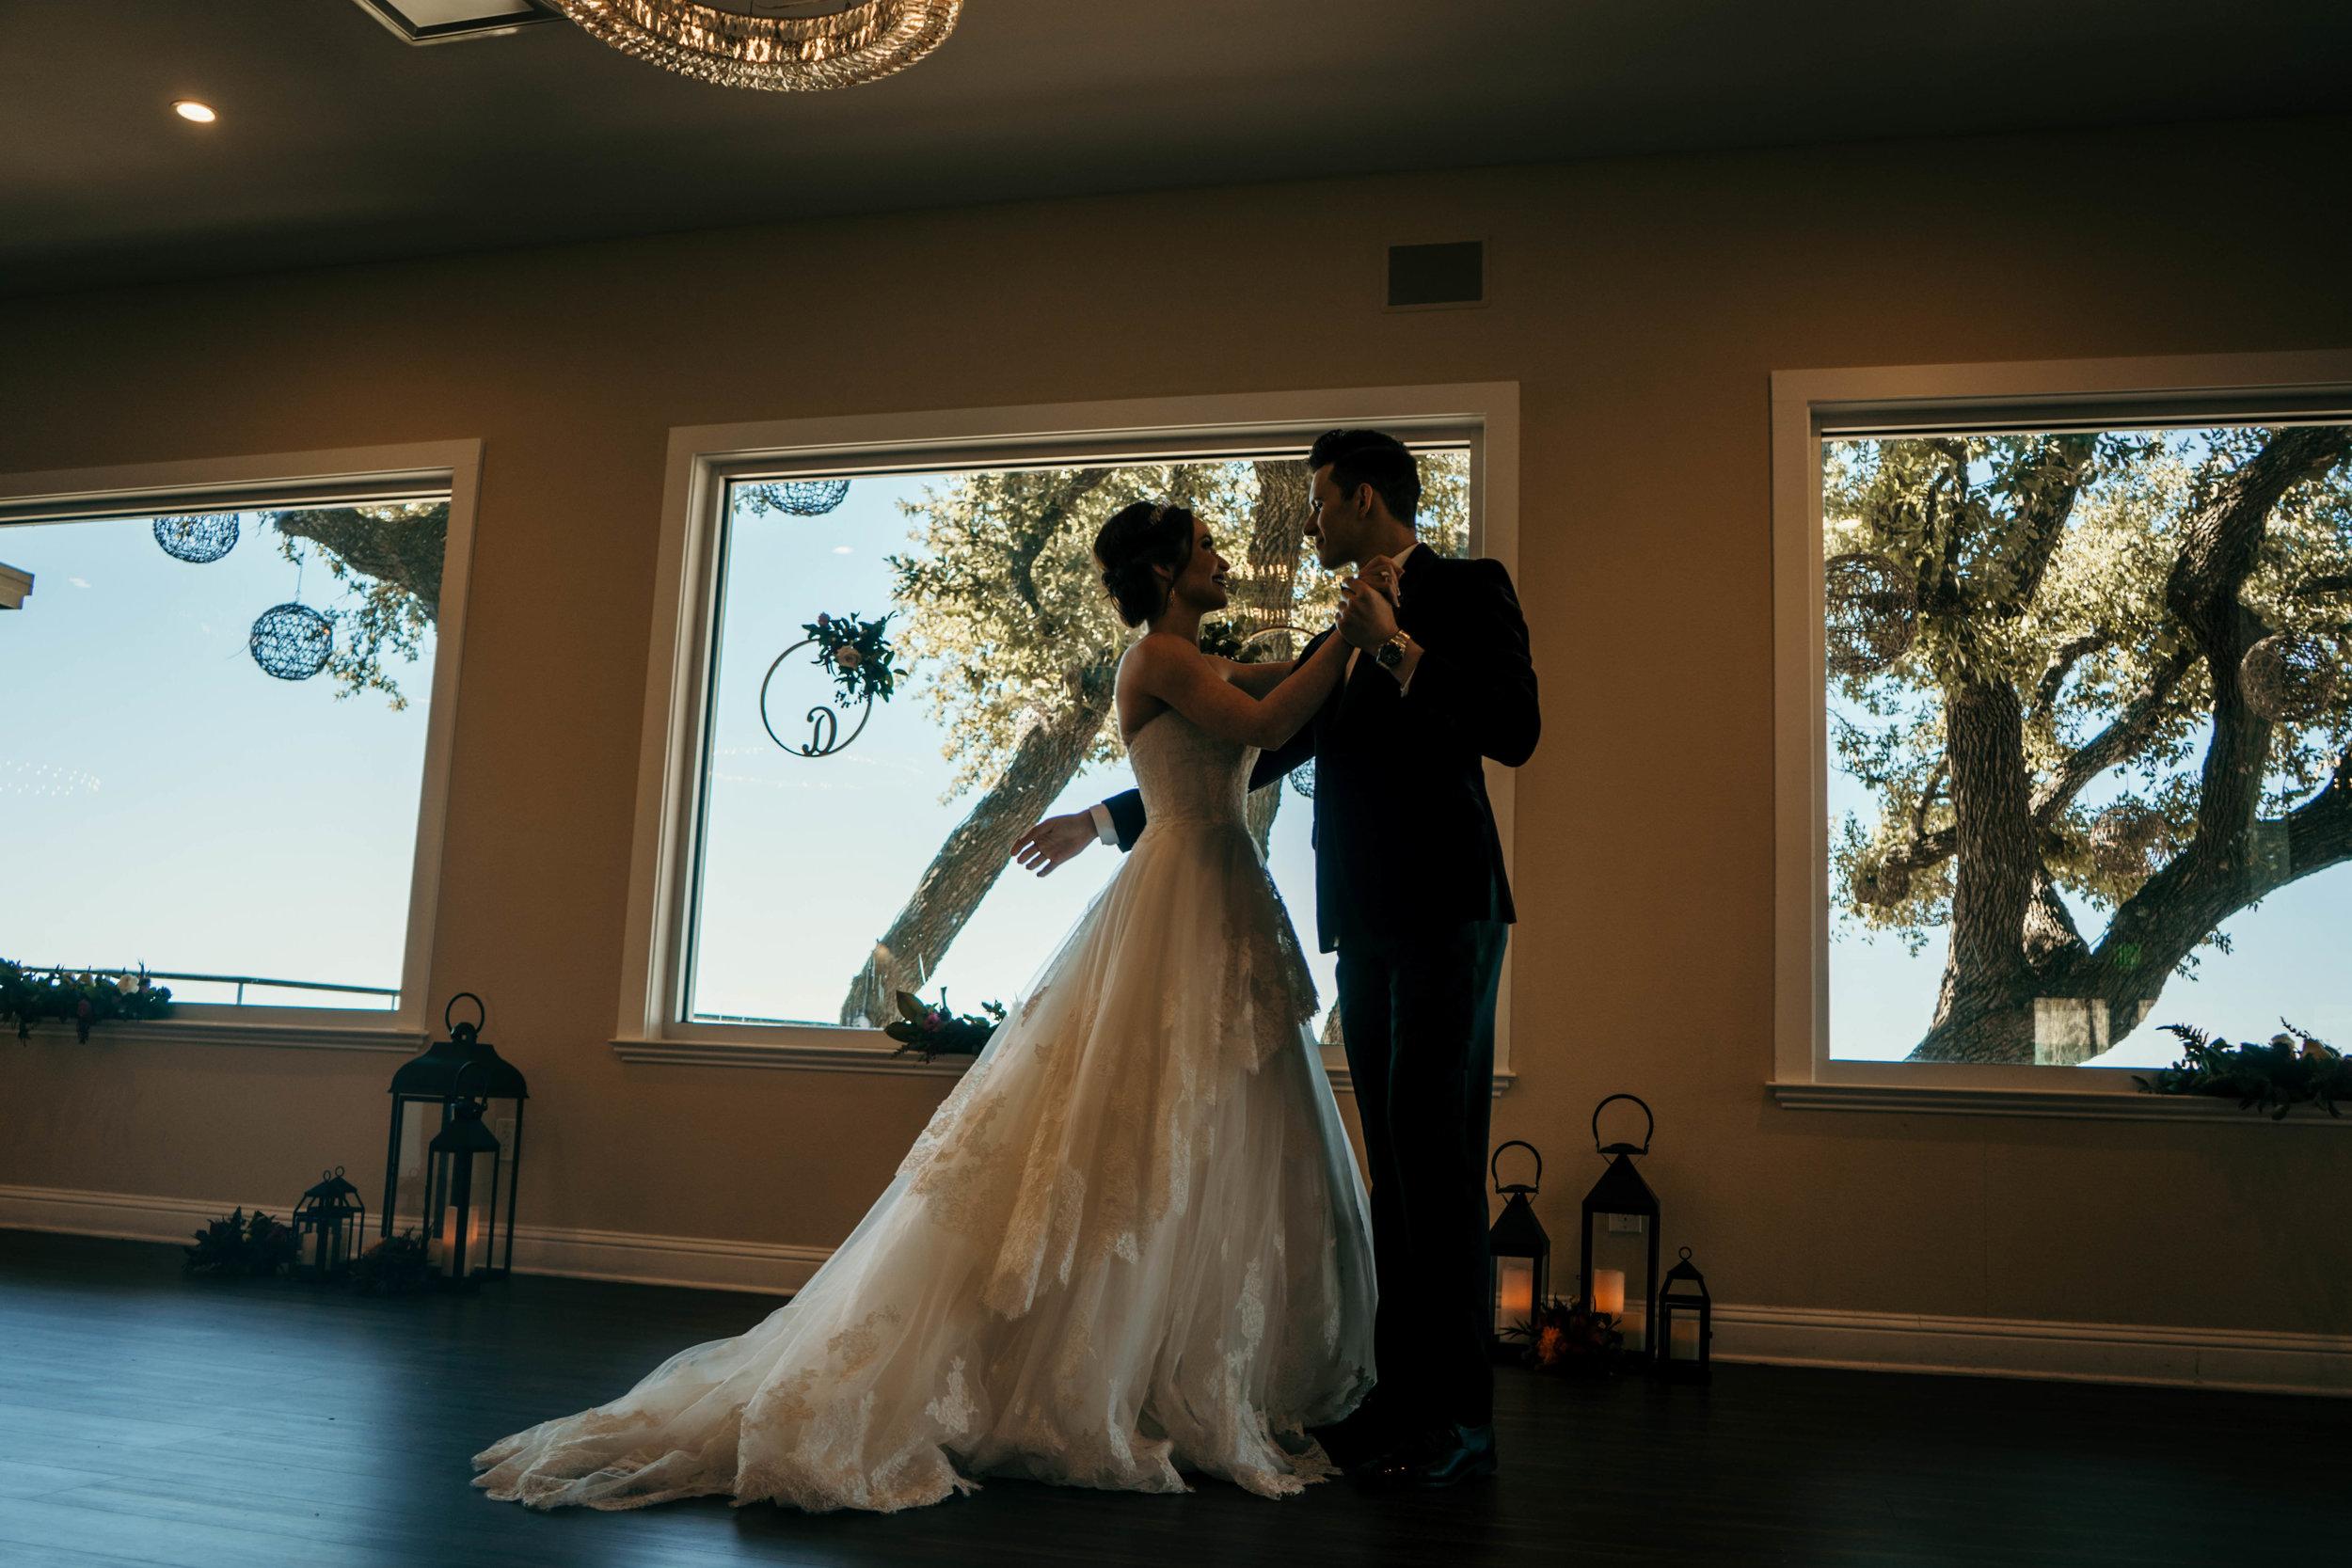 Austin Wedding Videographer - Dolls for Dolls (312 of 323).jpg